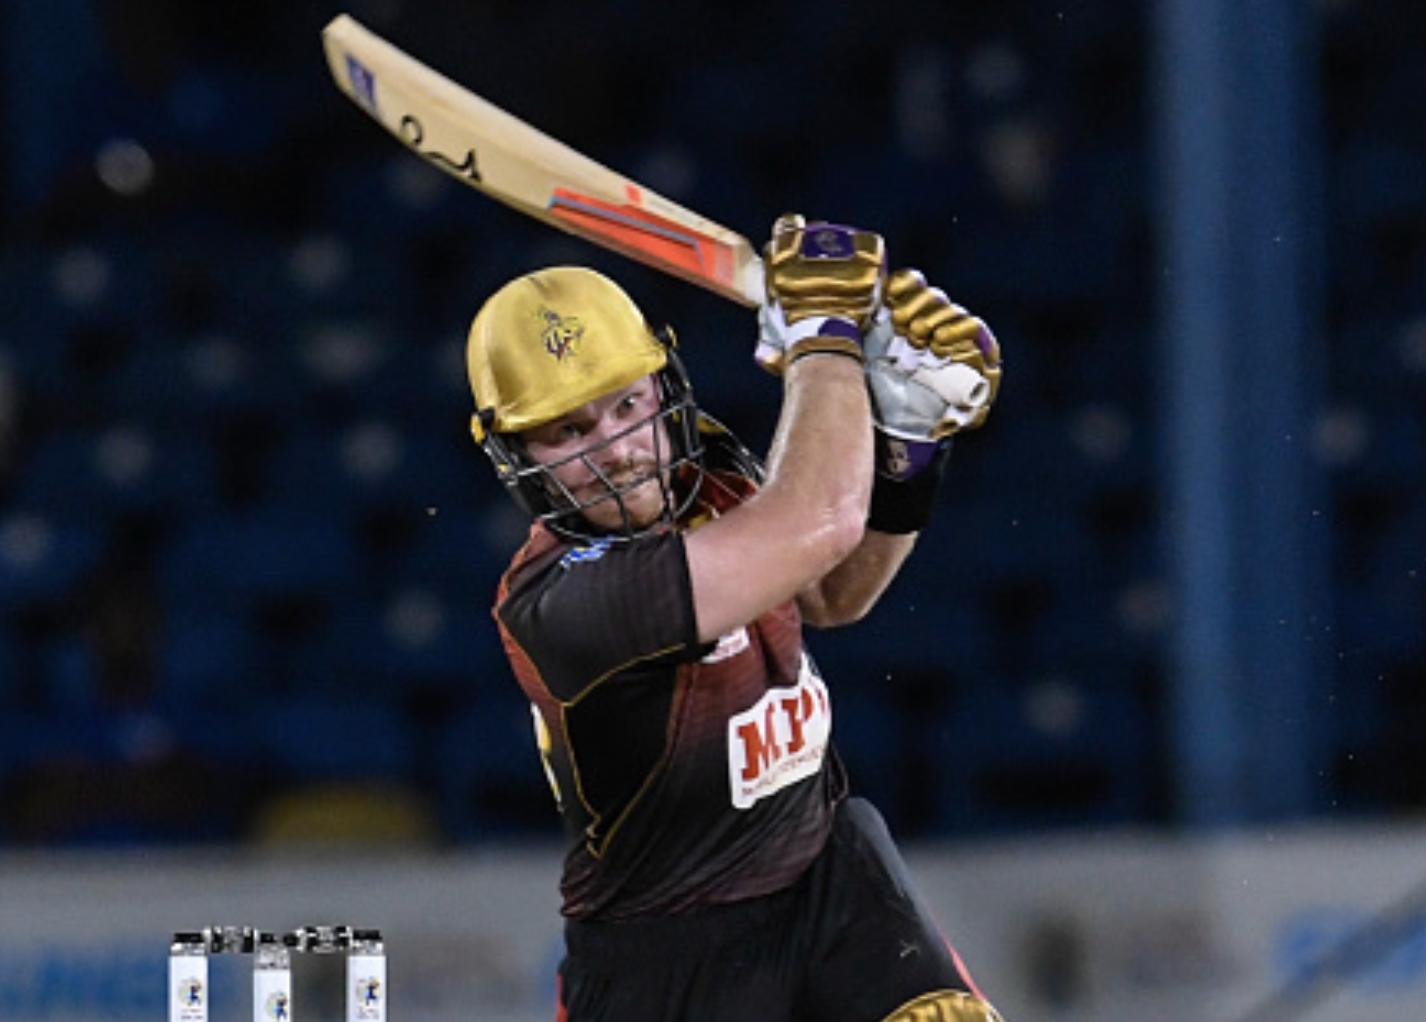 IPL 2021: KKR's Seifert tests Covid positive, stranded in India